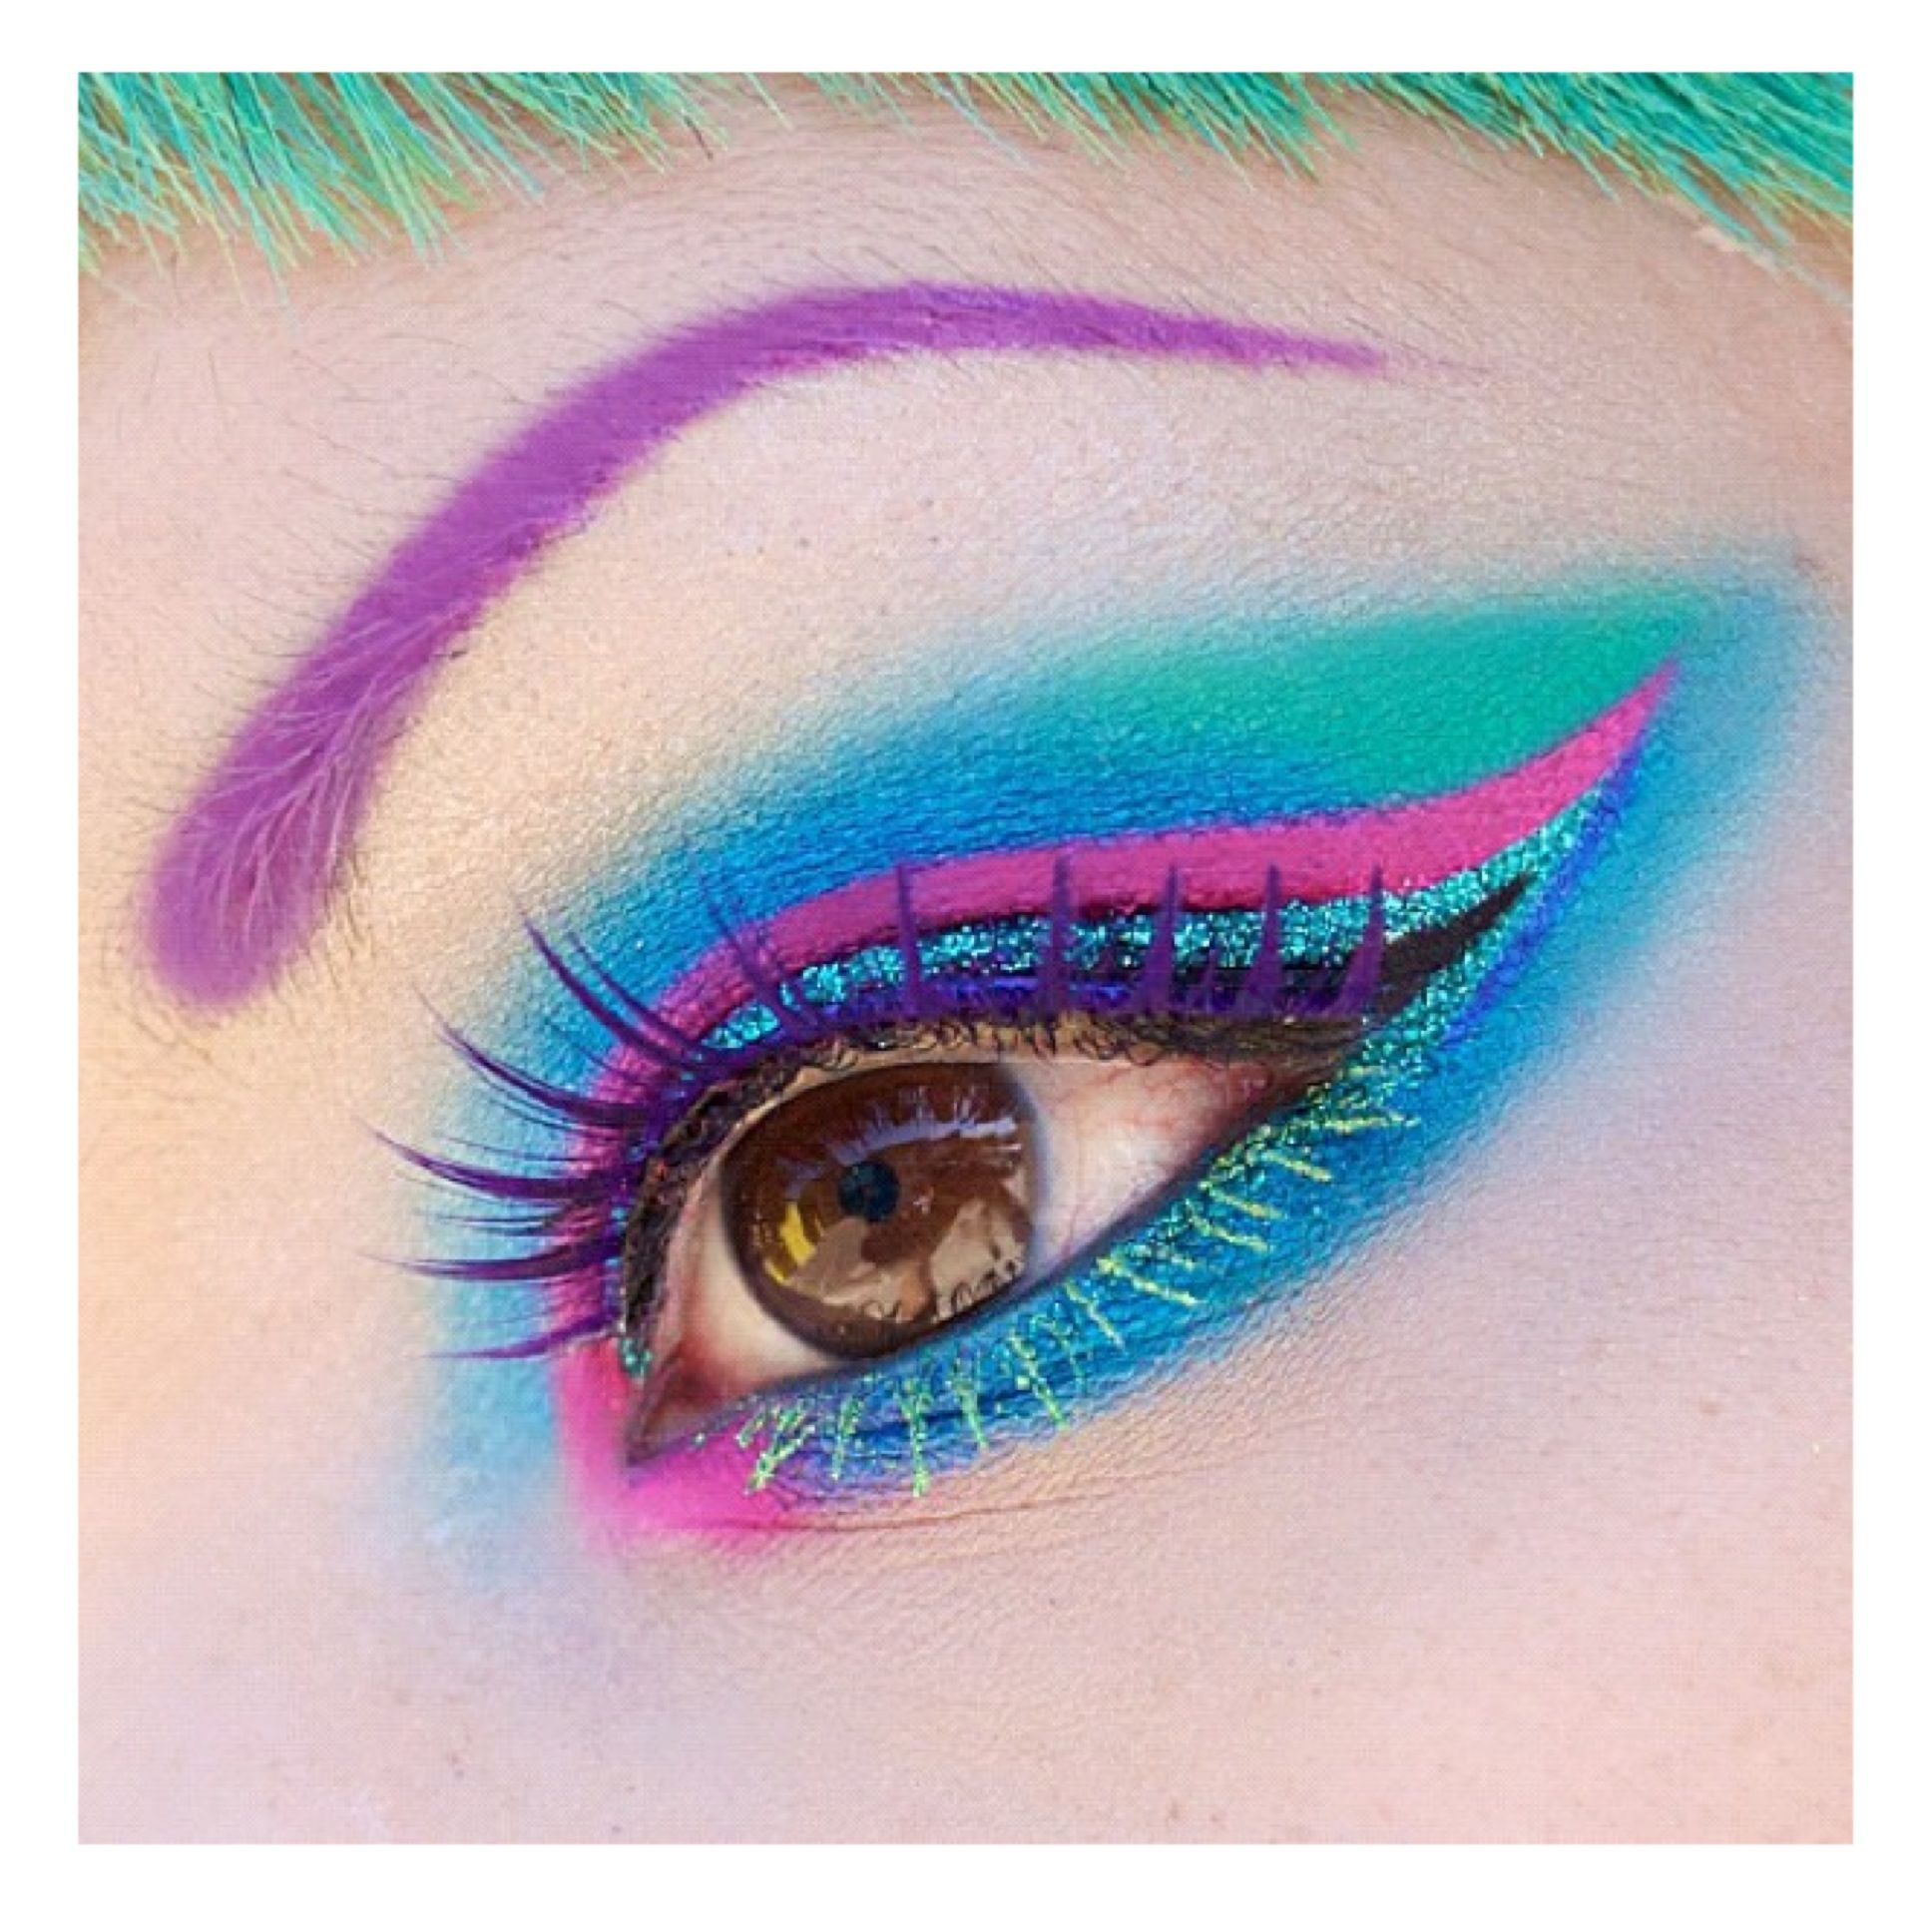 Purple brows, blue, pink eyeshadow, glitter liner, purple